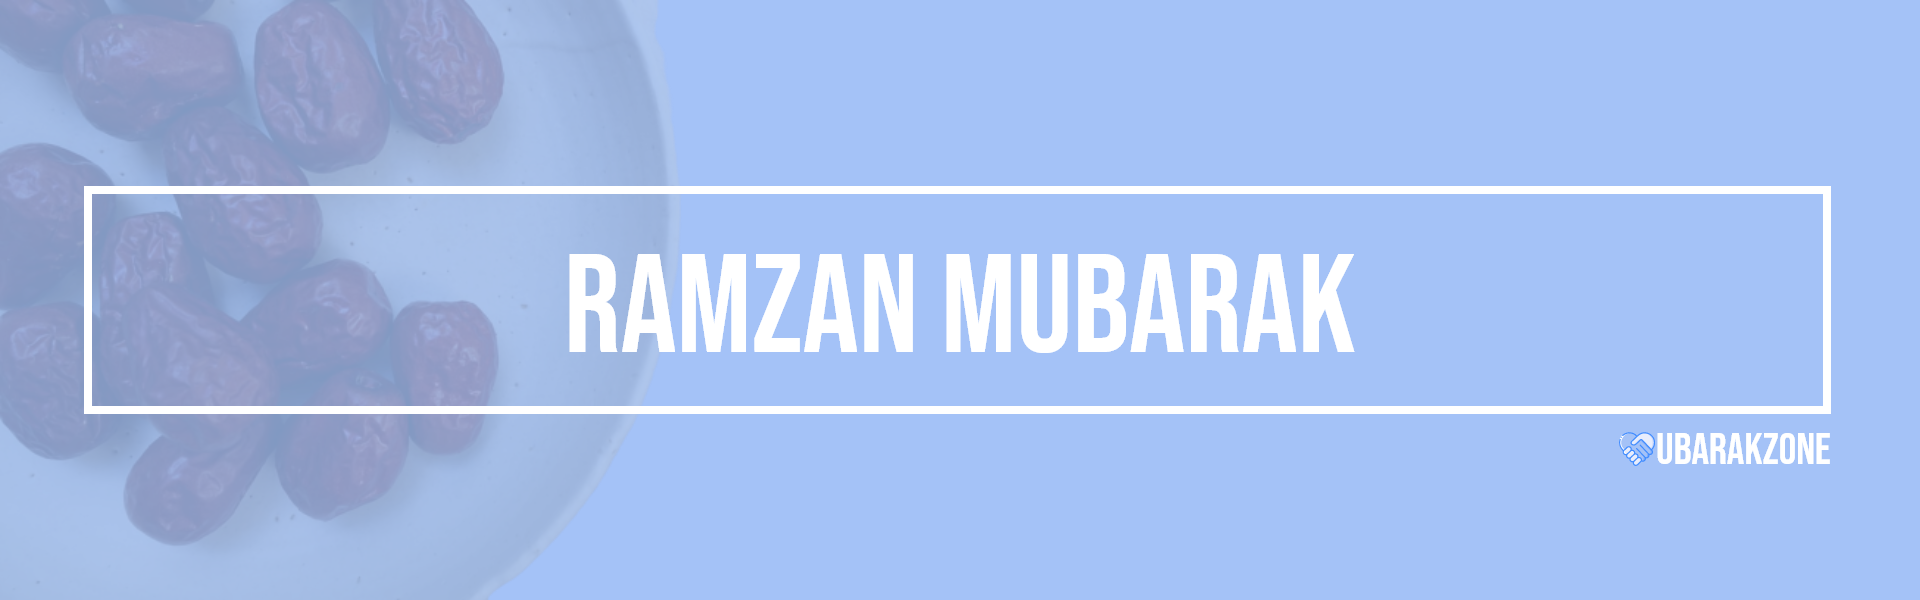 ramzan mubarak wishes messages